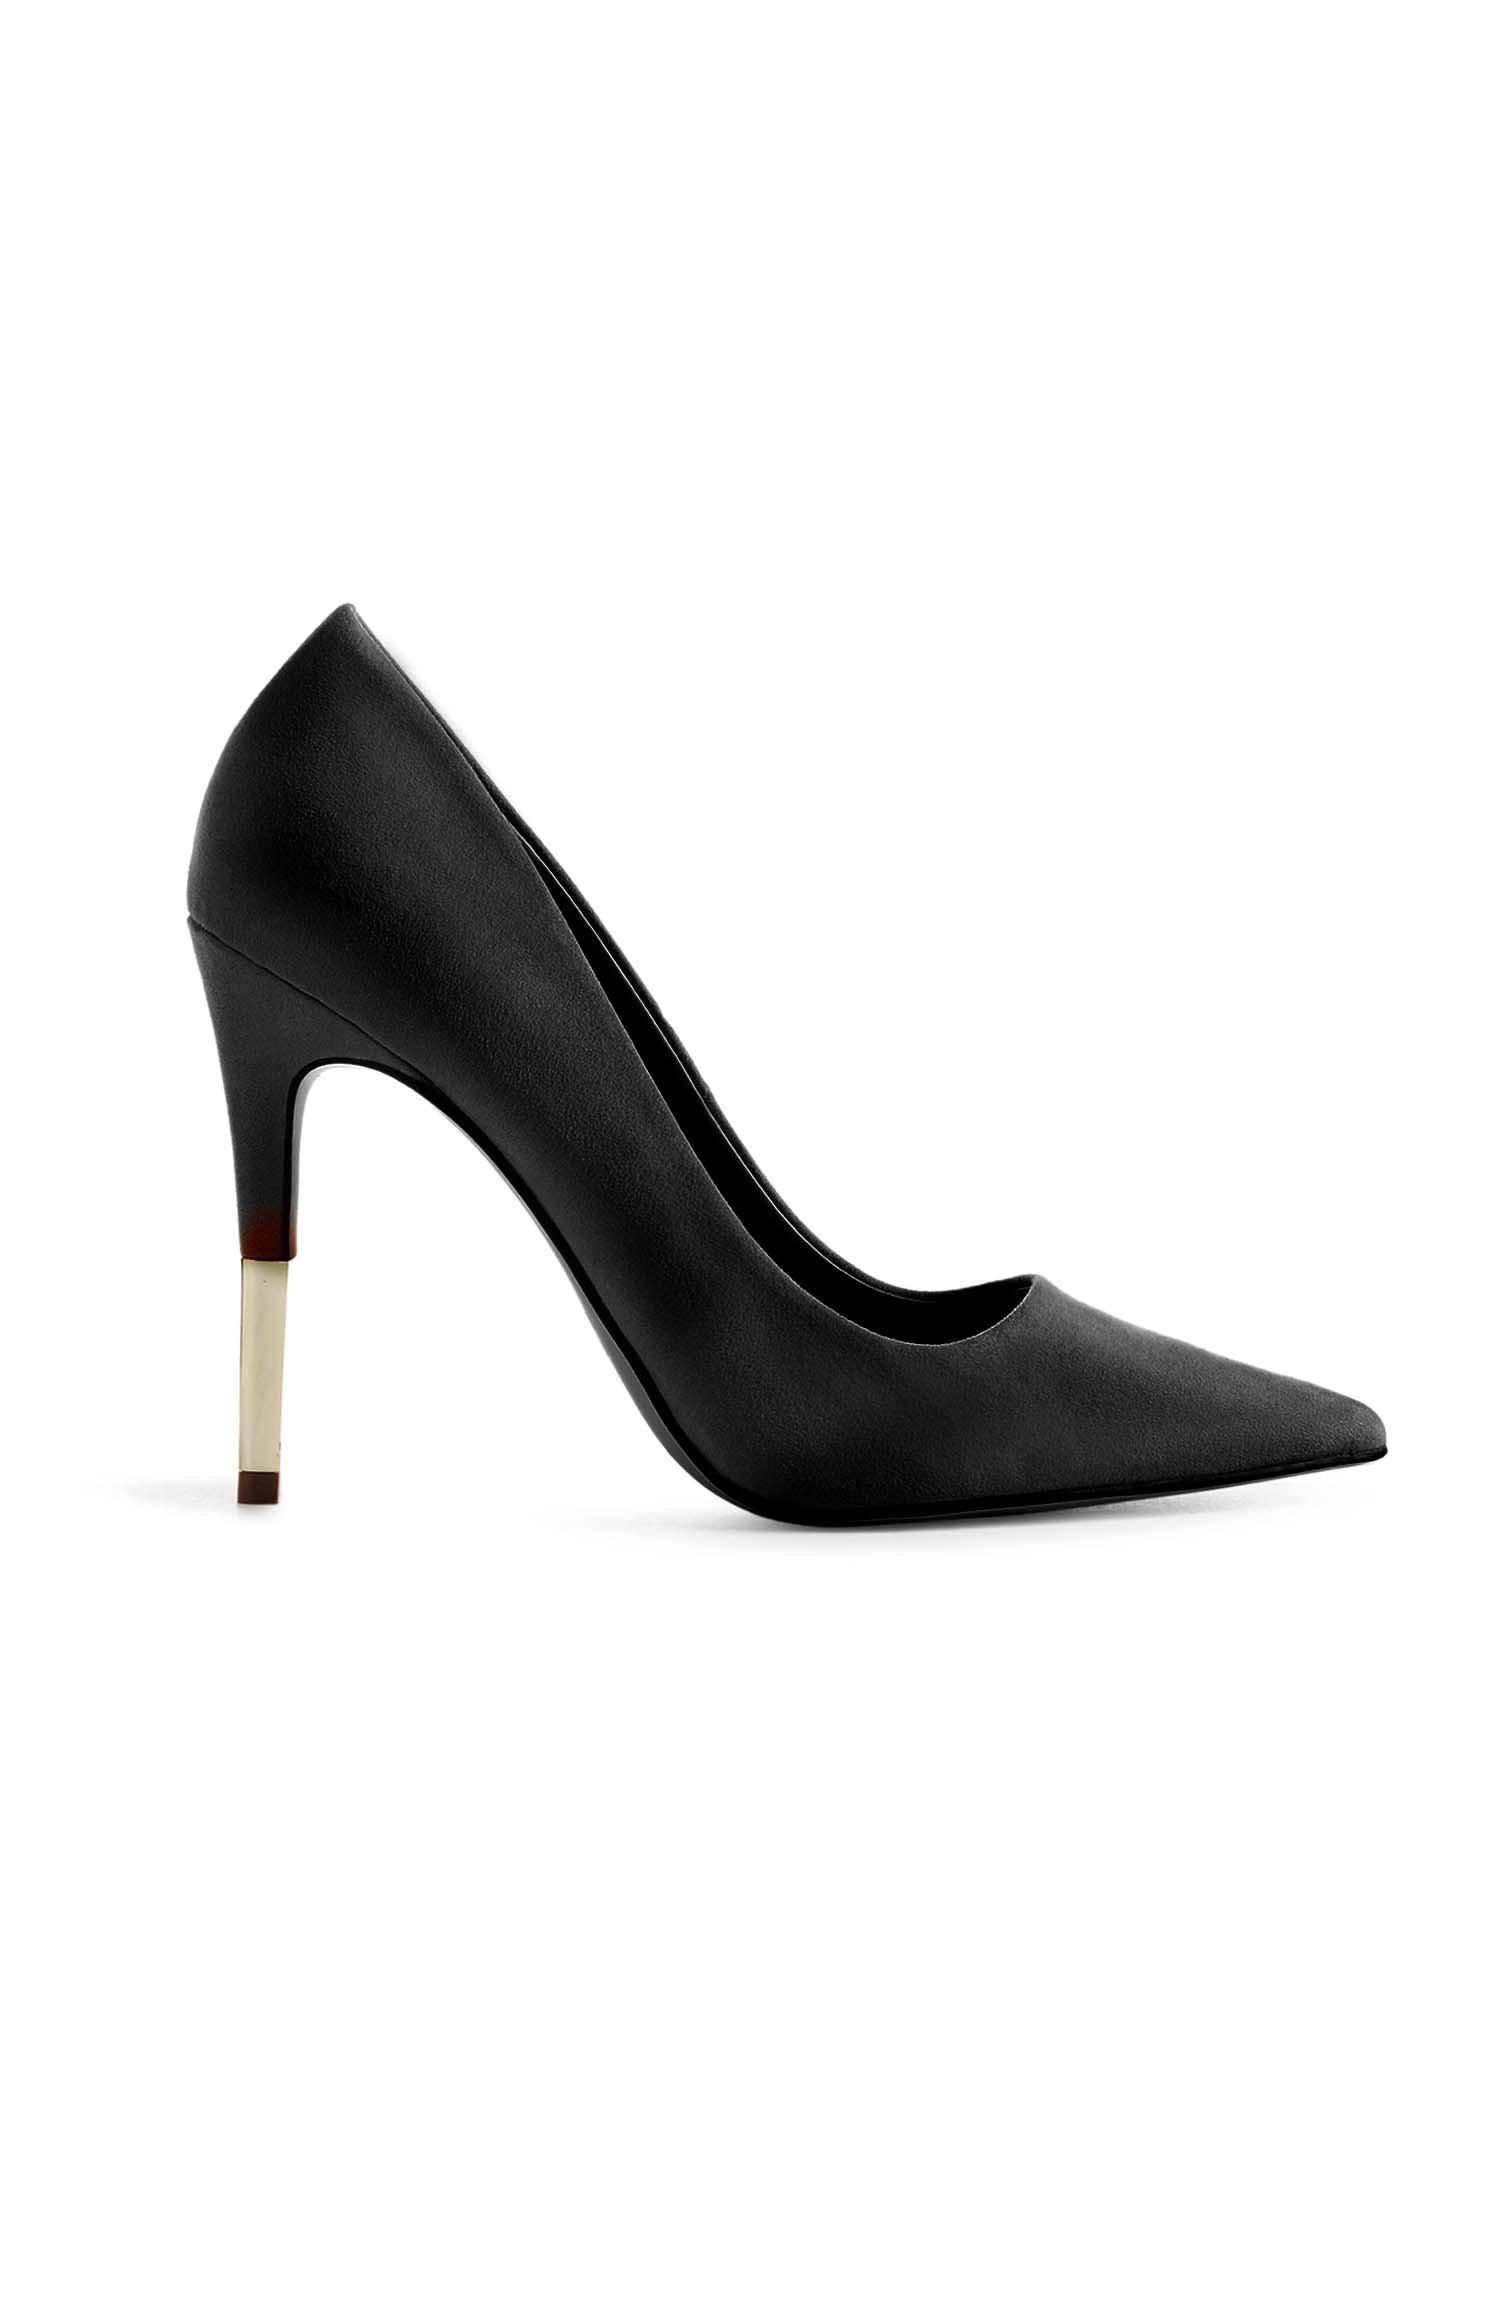 Black Stiletto Heel